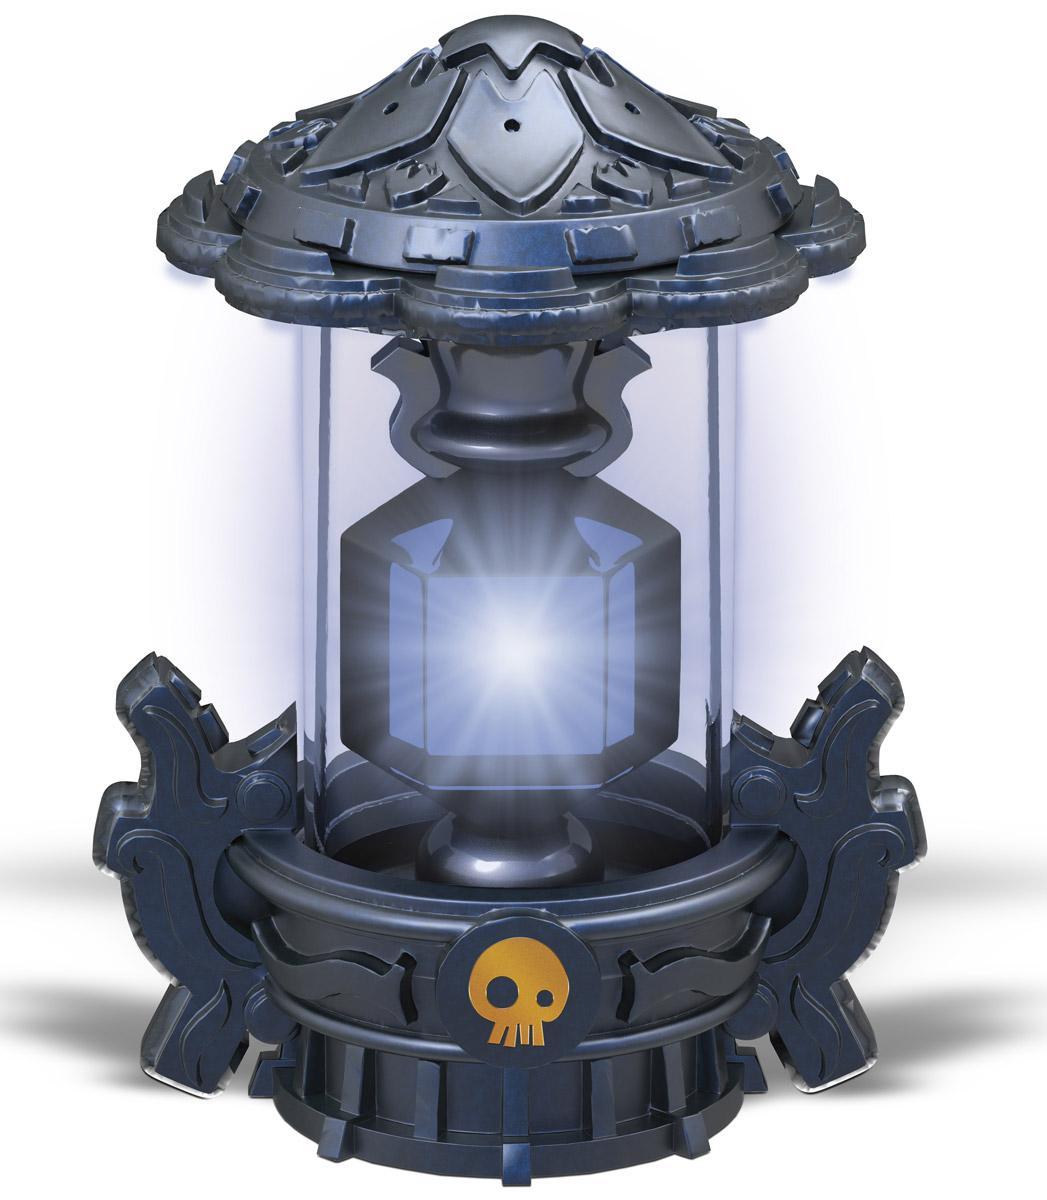 Skylanders Imaginators. Кристалл стихия Undead skylanders superchargers интерактивная фигурка суперзаряд big bubble pop fizz стихия magic